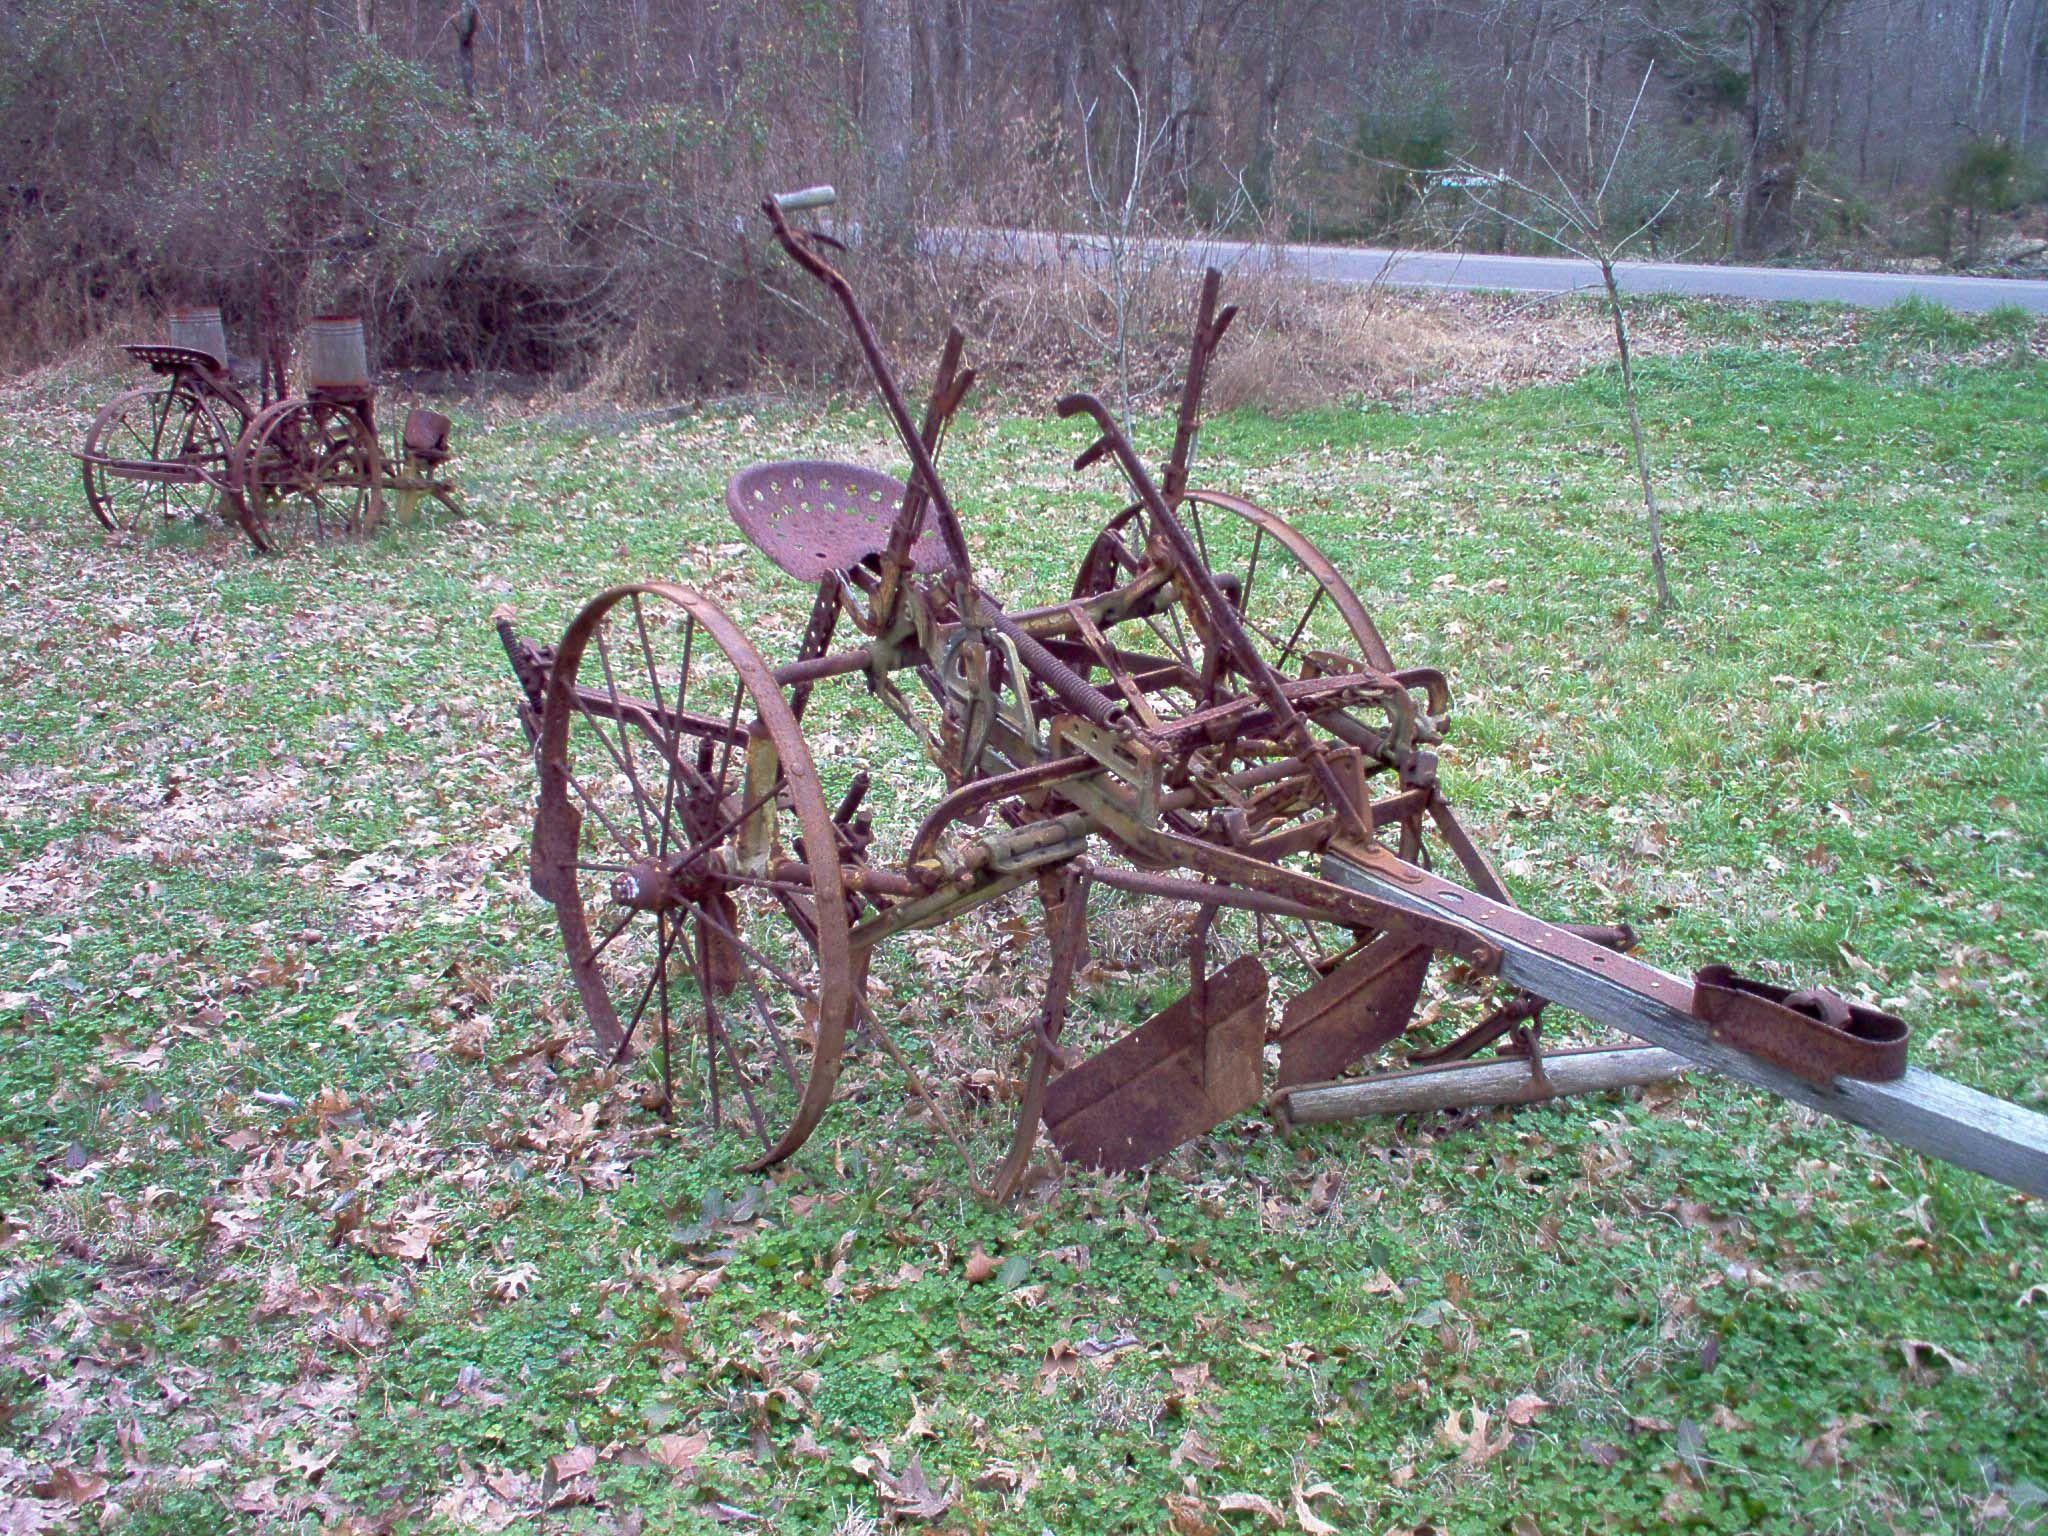 Vintage Farms Tractors For Sales : Old farms for sale antique farm equipment